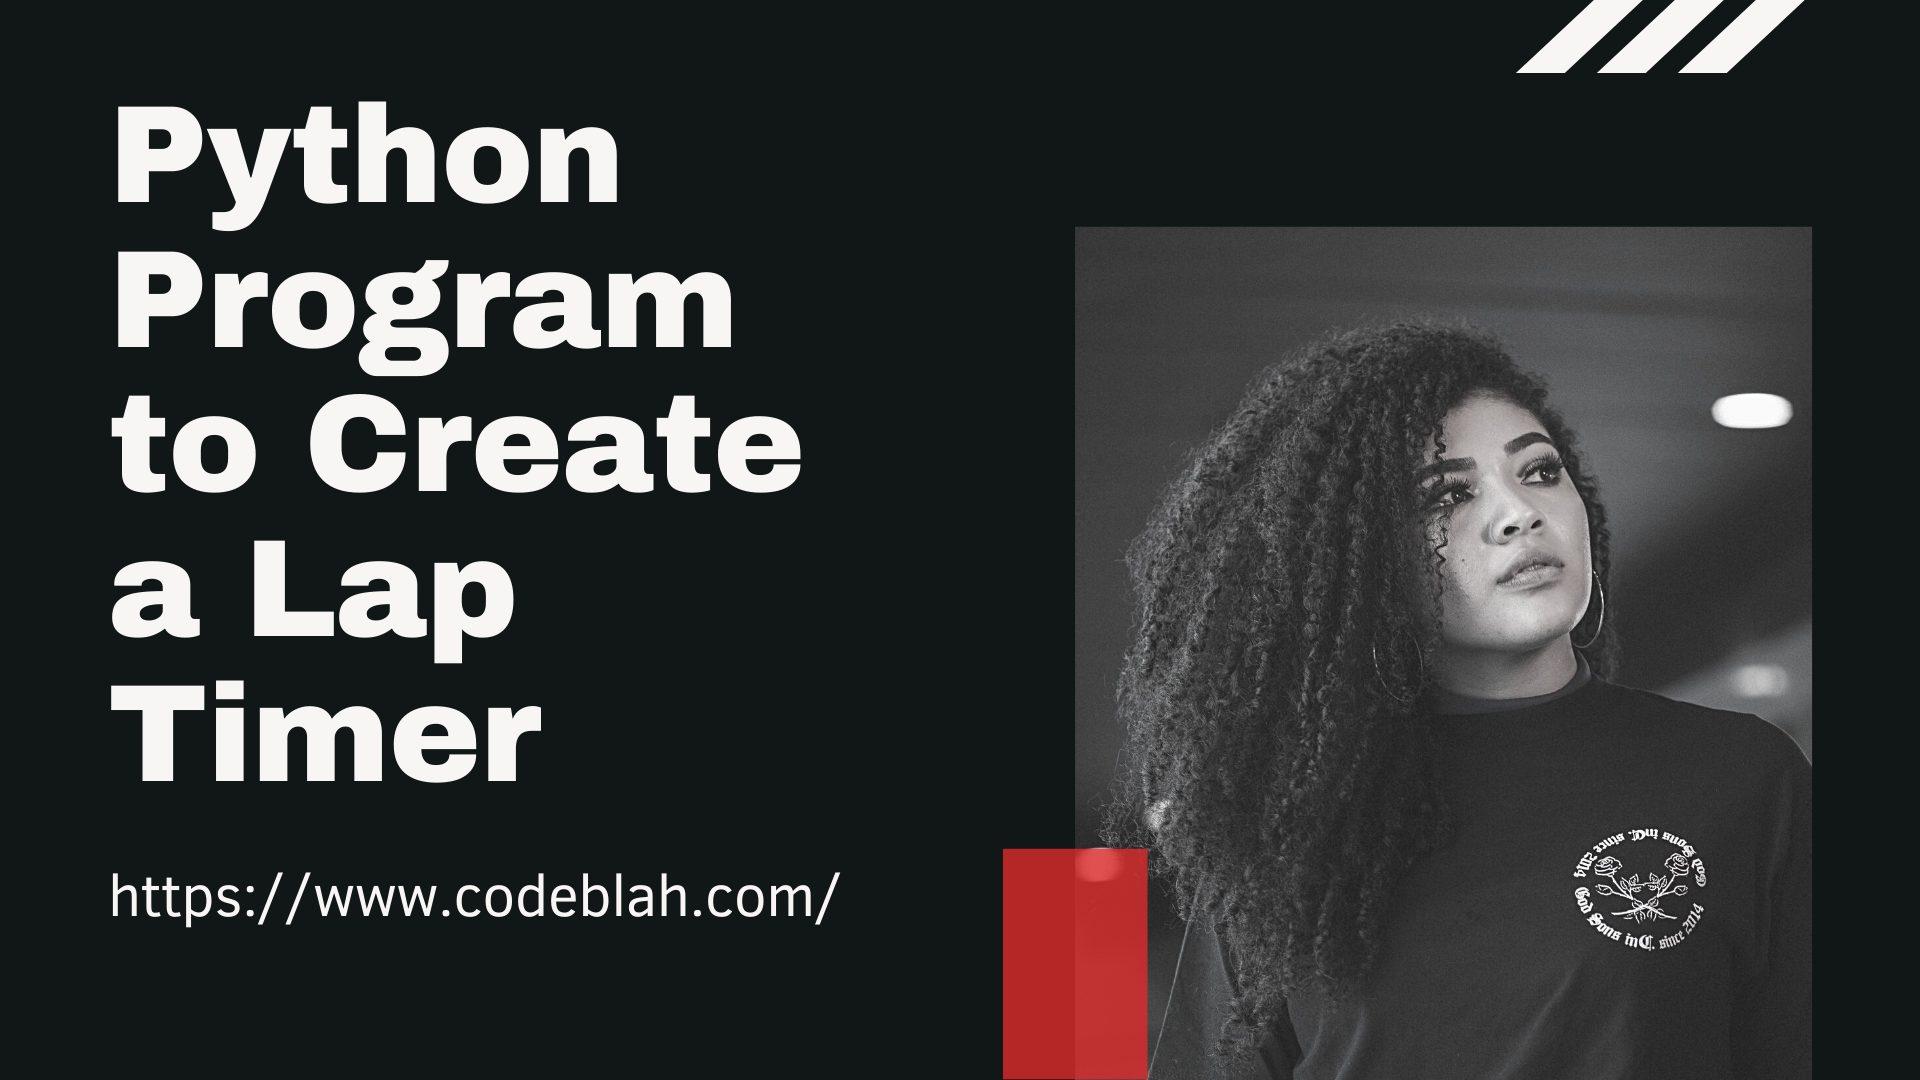 Python Program to Create a Lap Timer